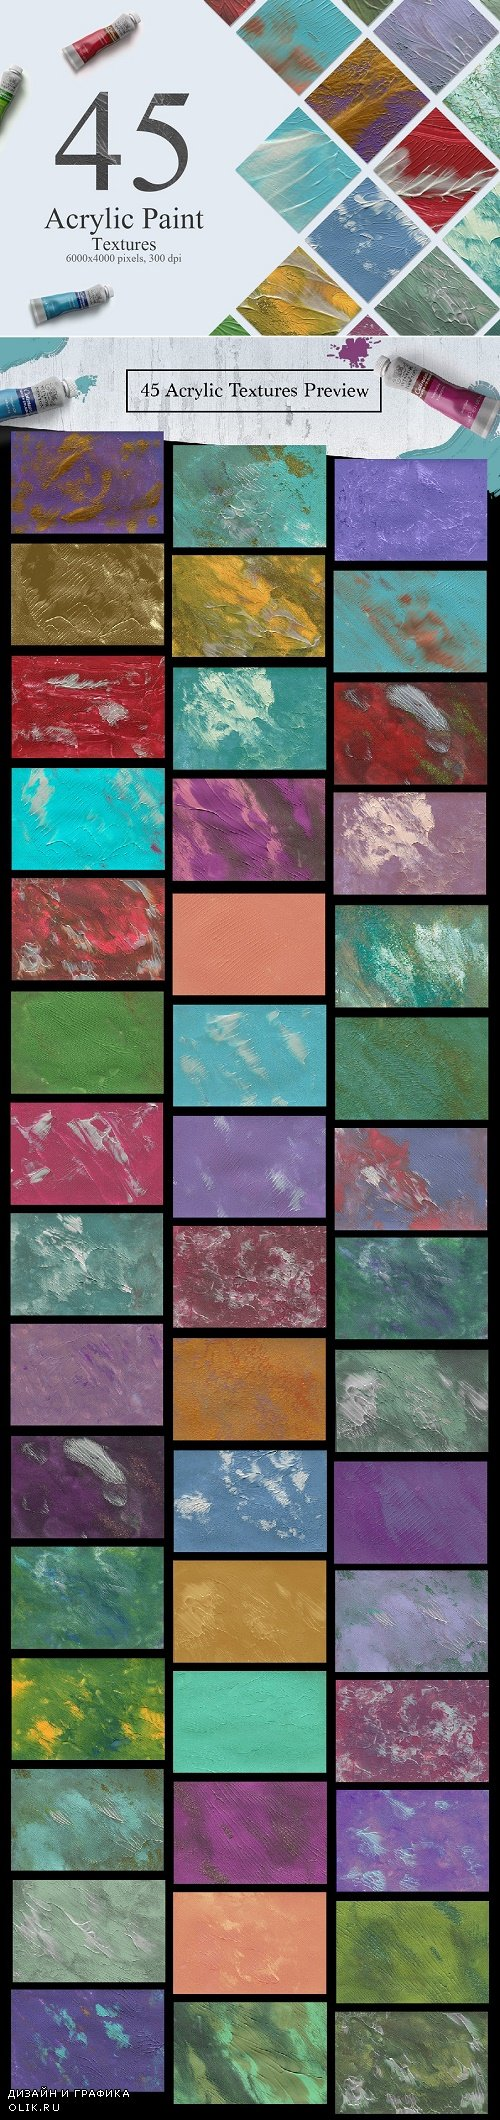 45 Acrylic Paint Textures - 2218307